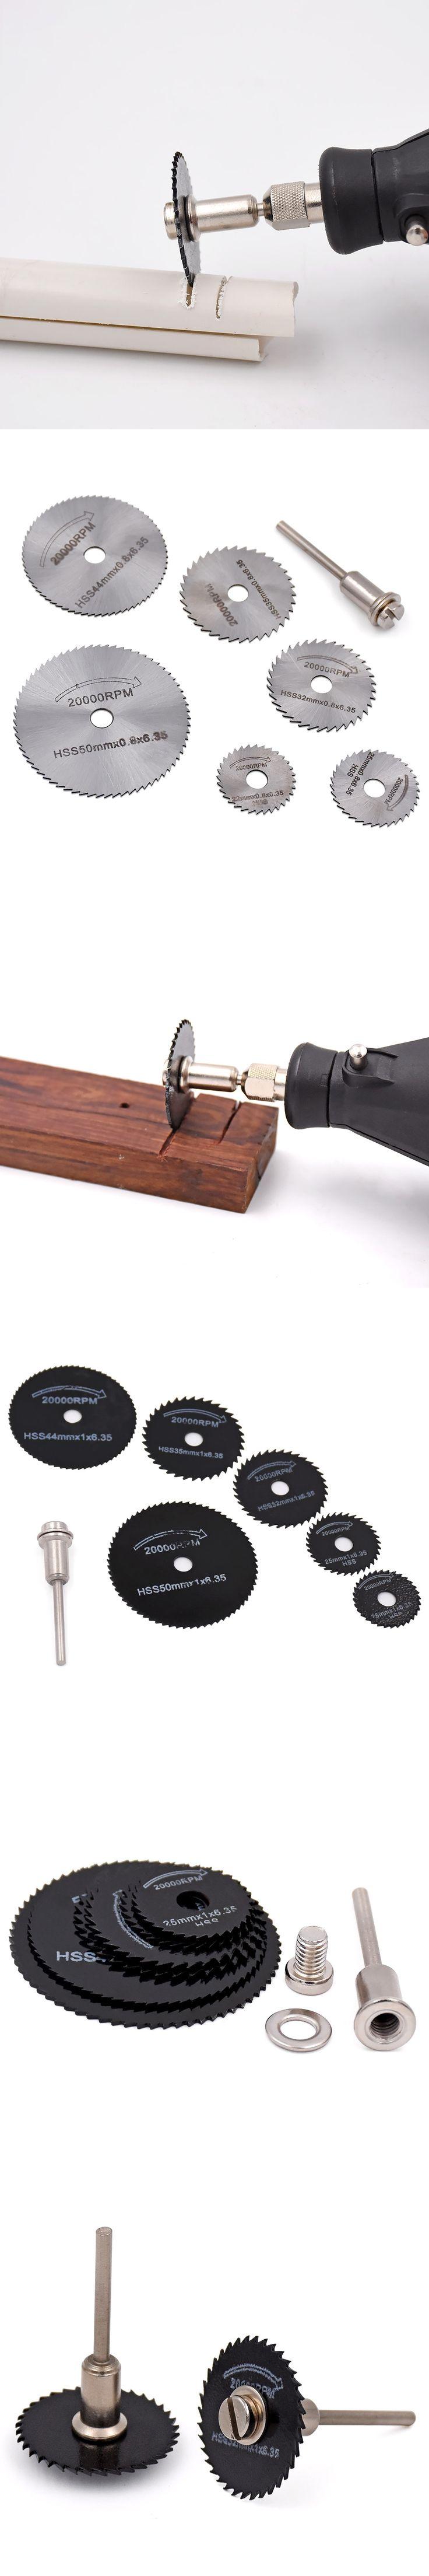 7pcs/set Mini HSS Circular Saw Blade For Dremel Accessory Metal Cutter Power Tool Set Wood Cutting Discs Drill Mandrel Cutoff